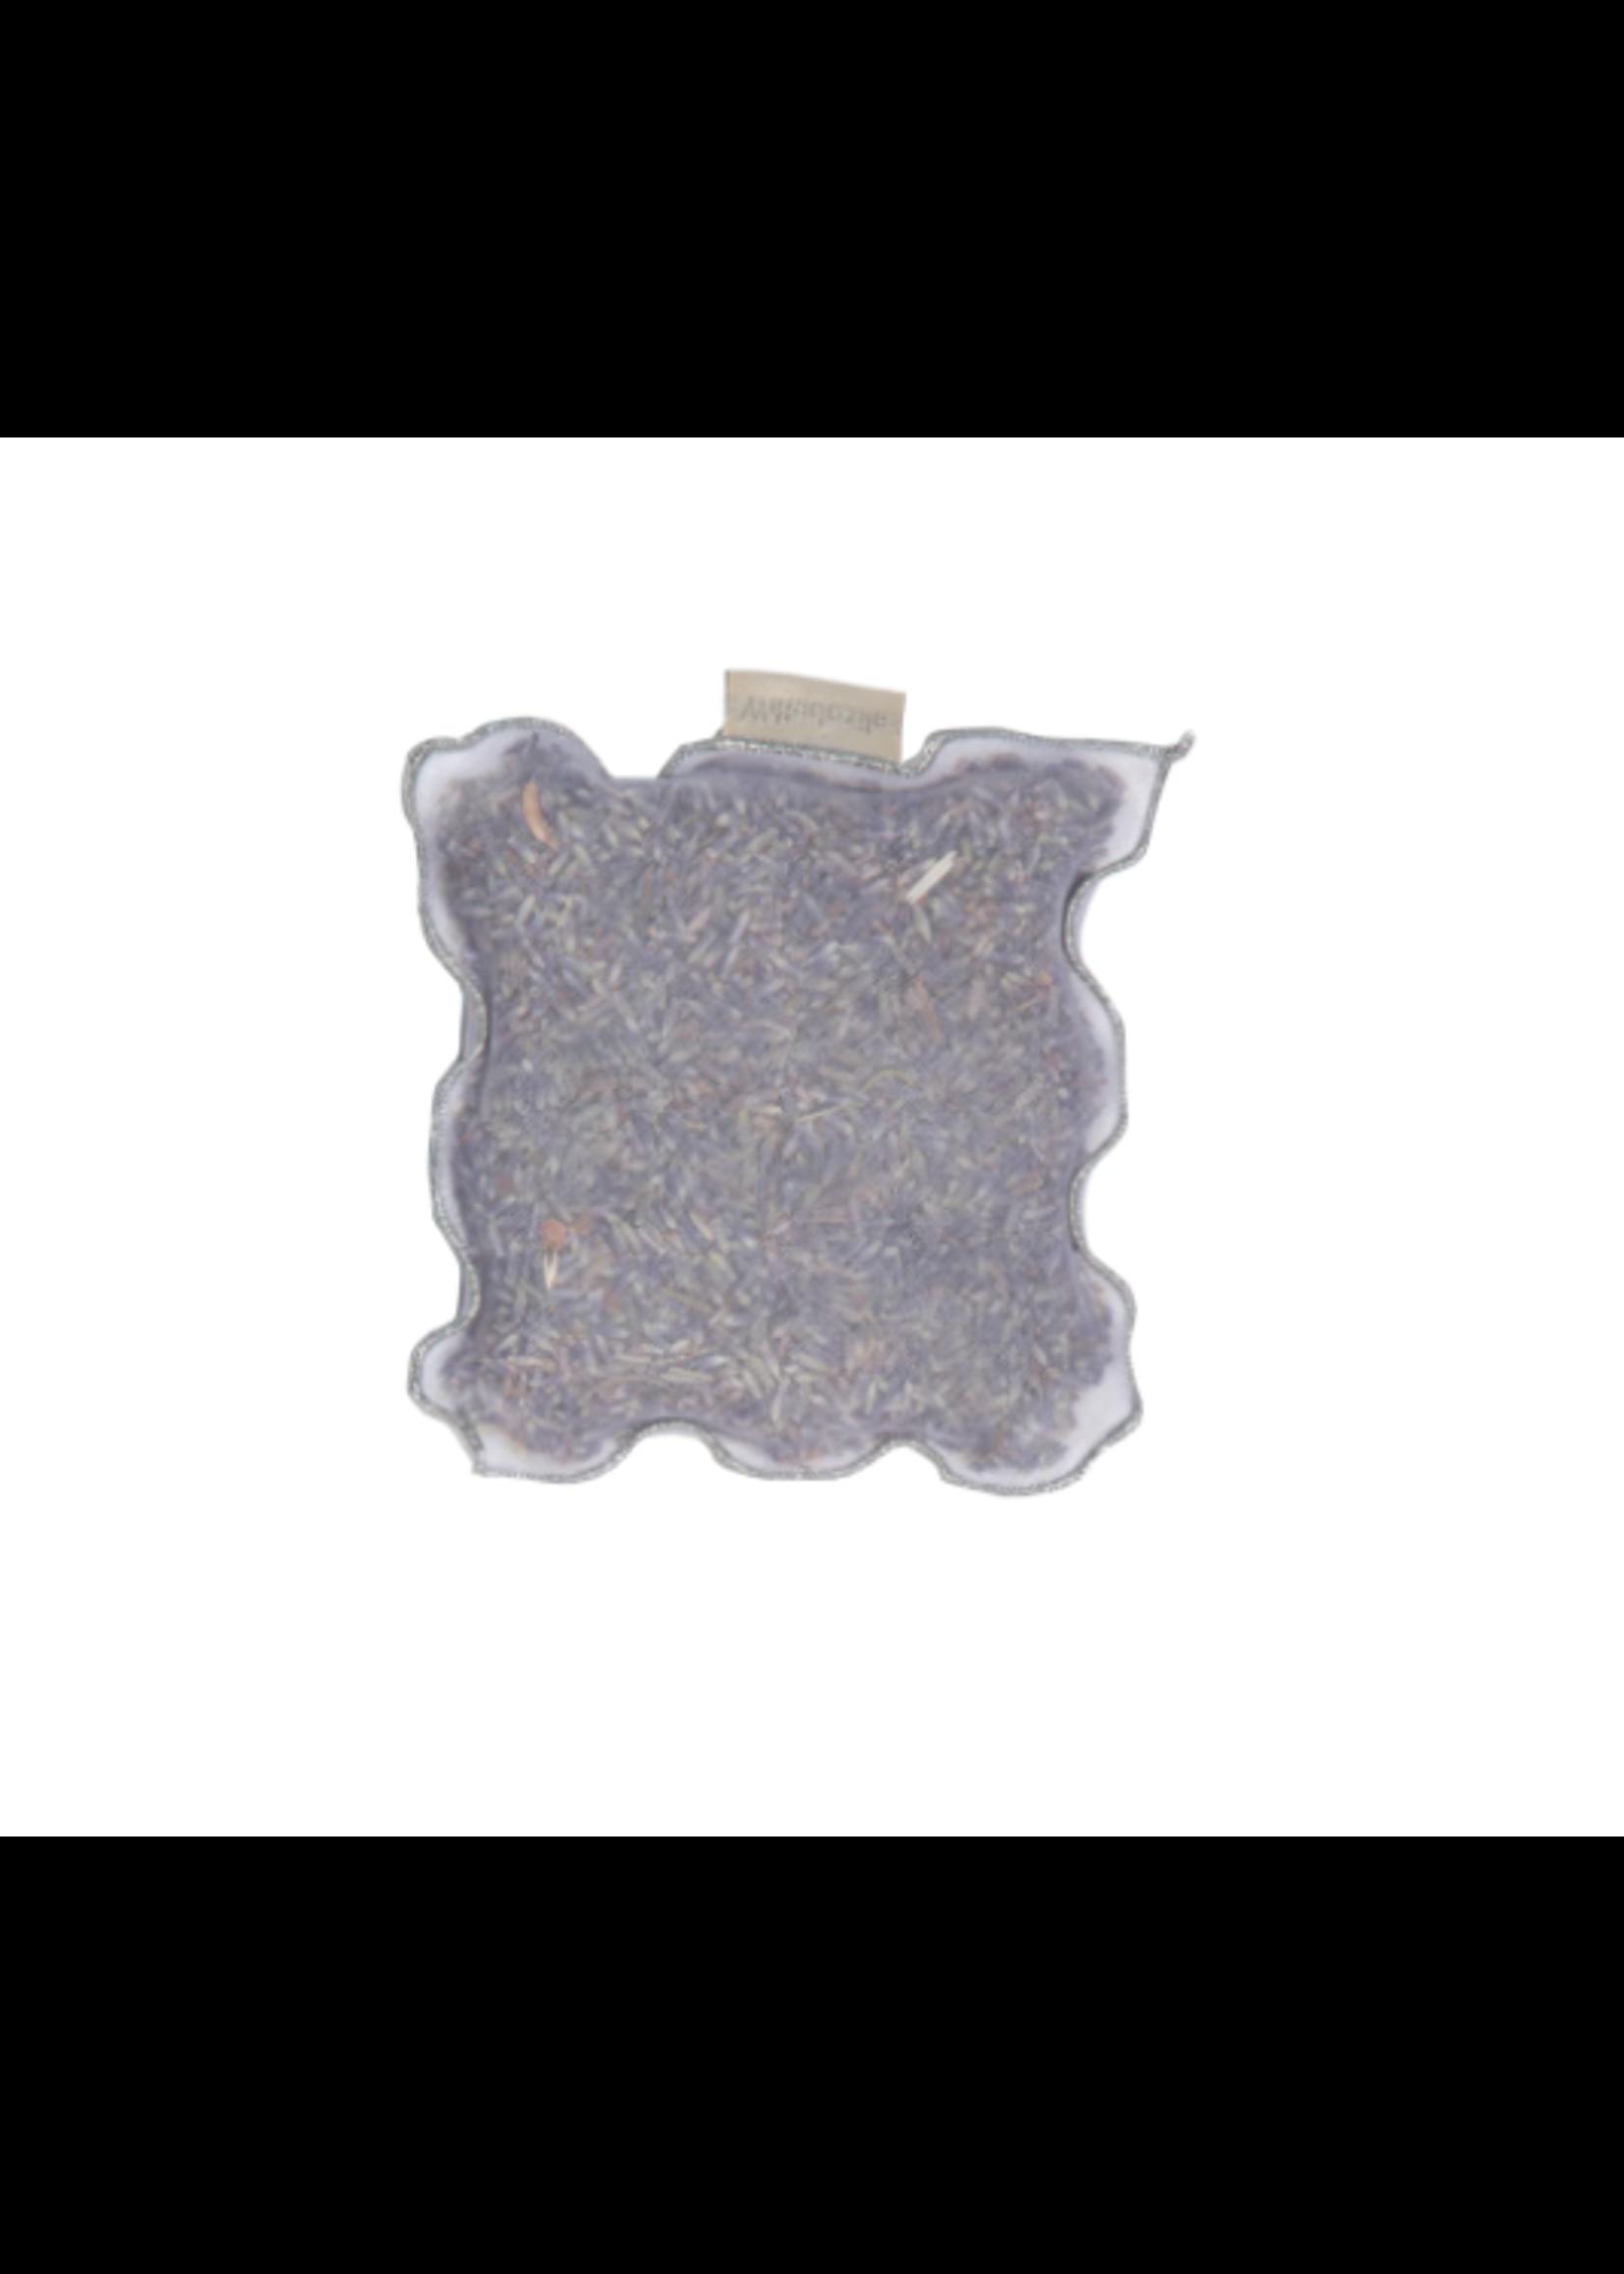 Elizabeth W Lavender Sachet - Silver Edge